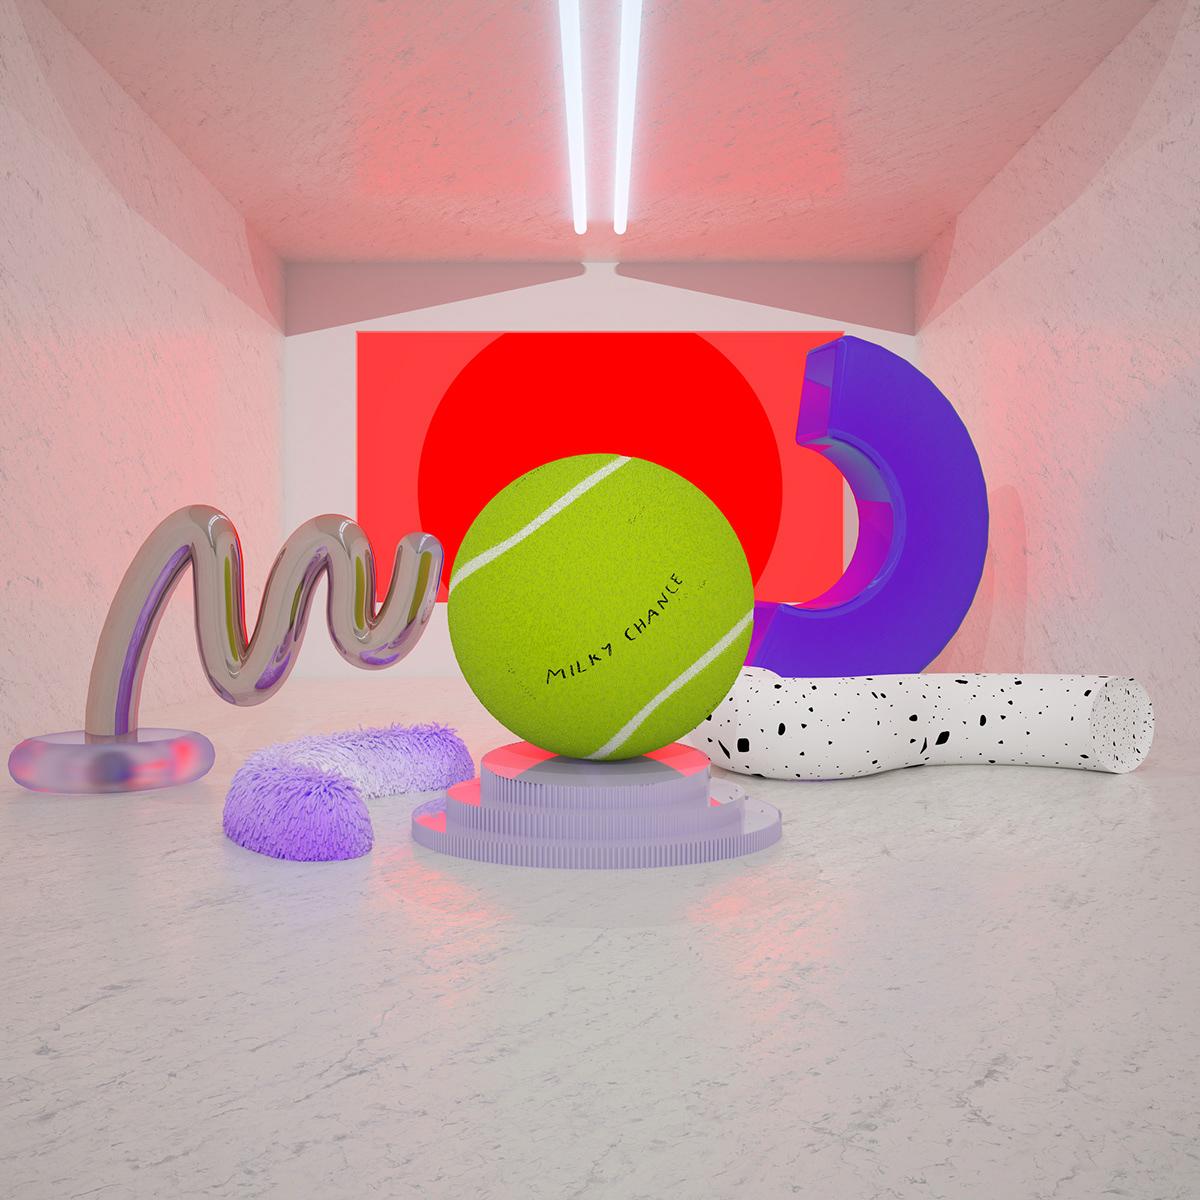 Image may contain: wall, ball and indoor